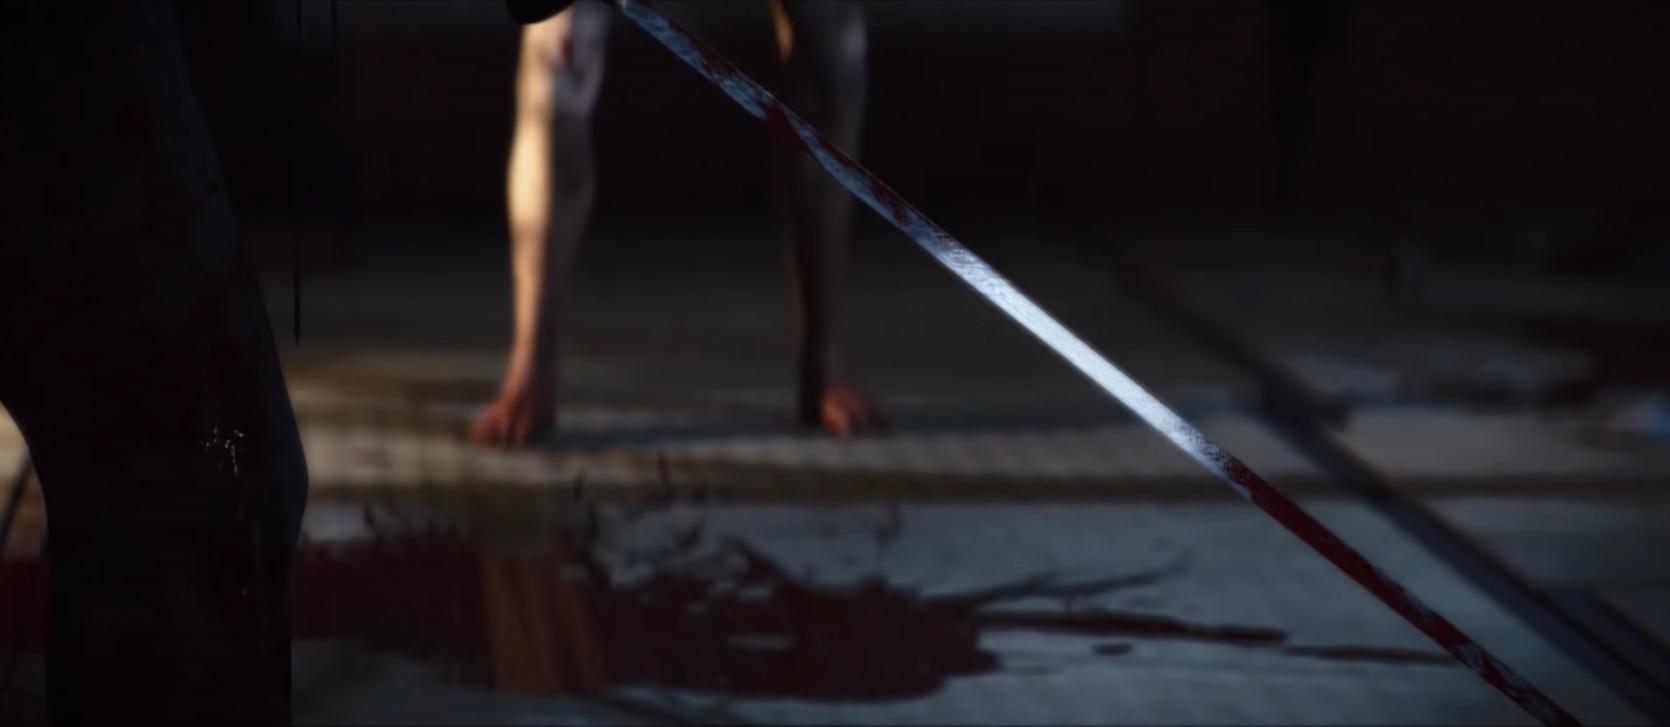 Dead by Daylight First Cut Trailer Shot